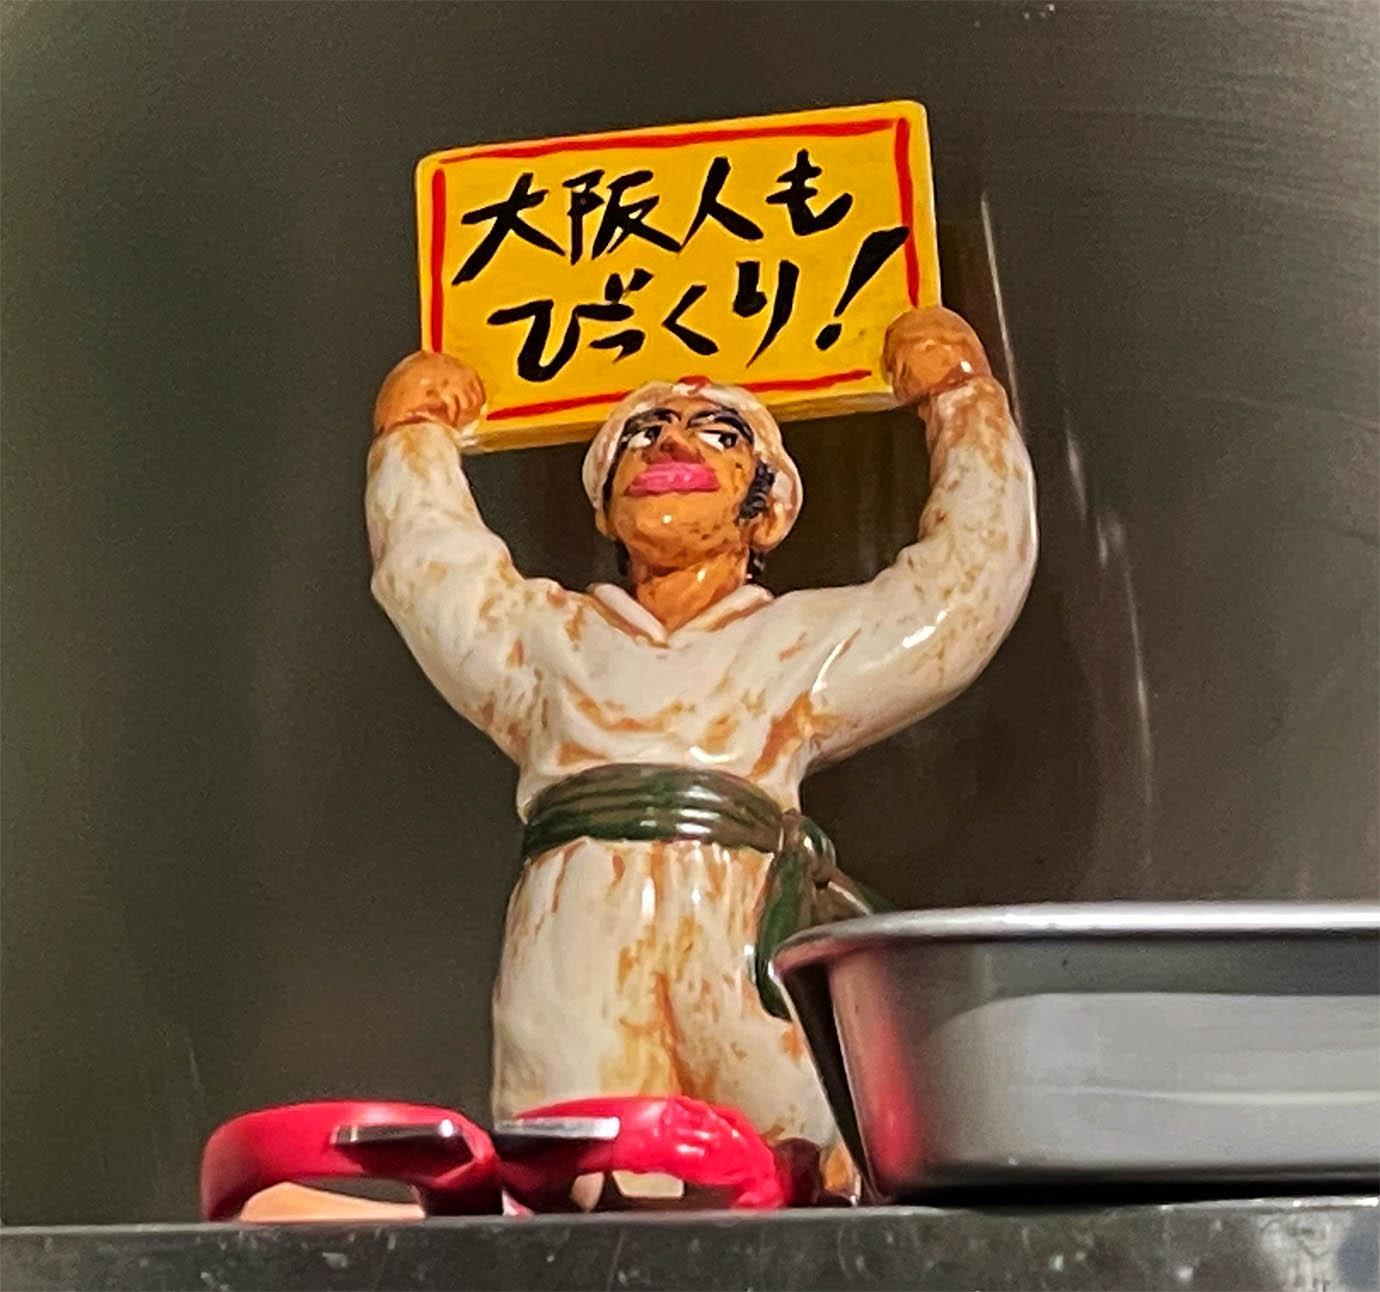 osaka-madras-curry-akasaka5